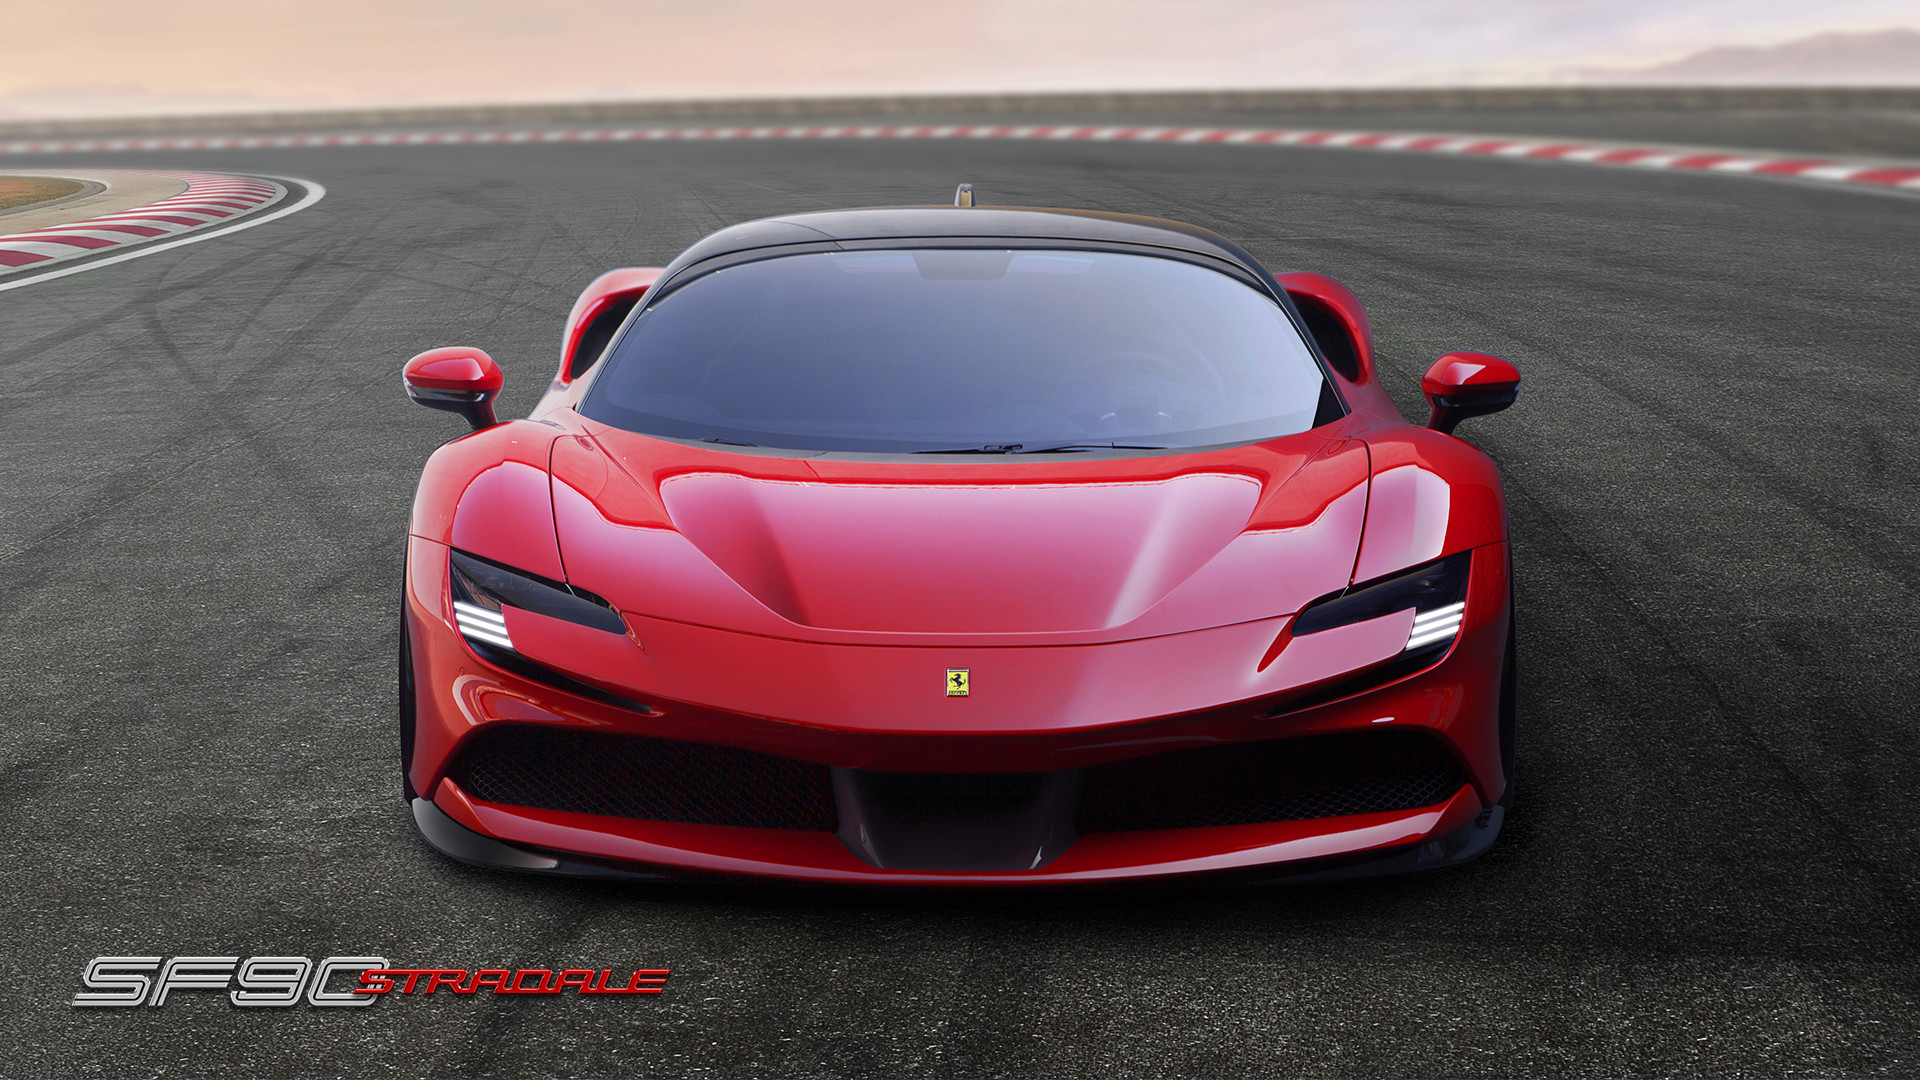 2020 Ferrari SF90 Stradale Front View